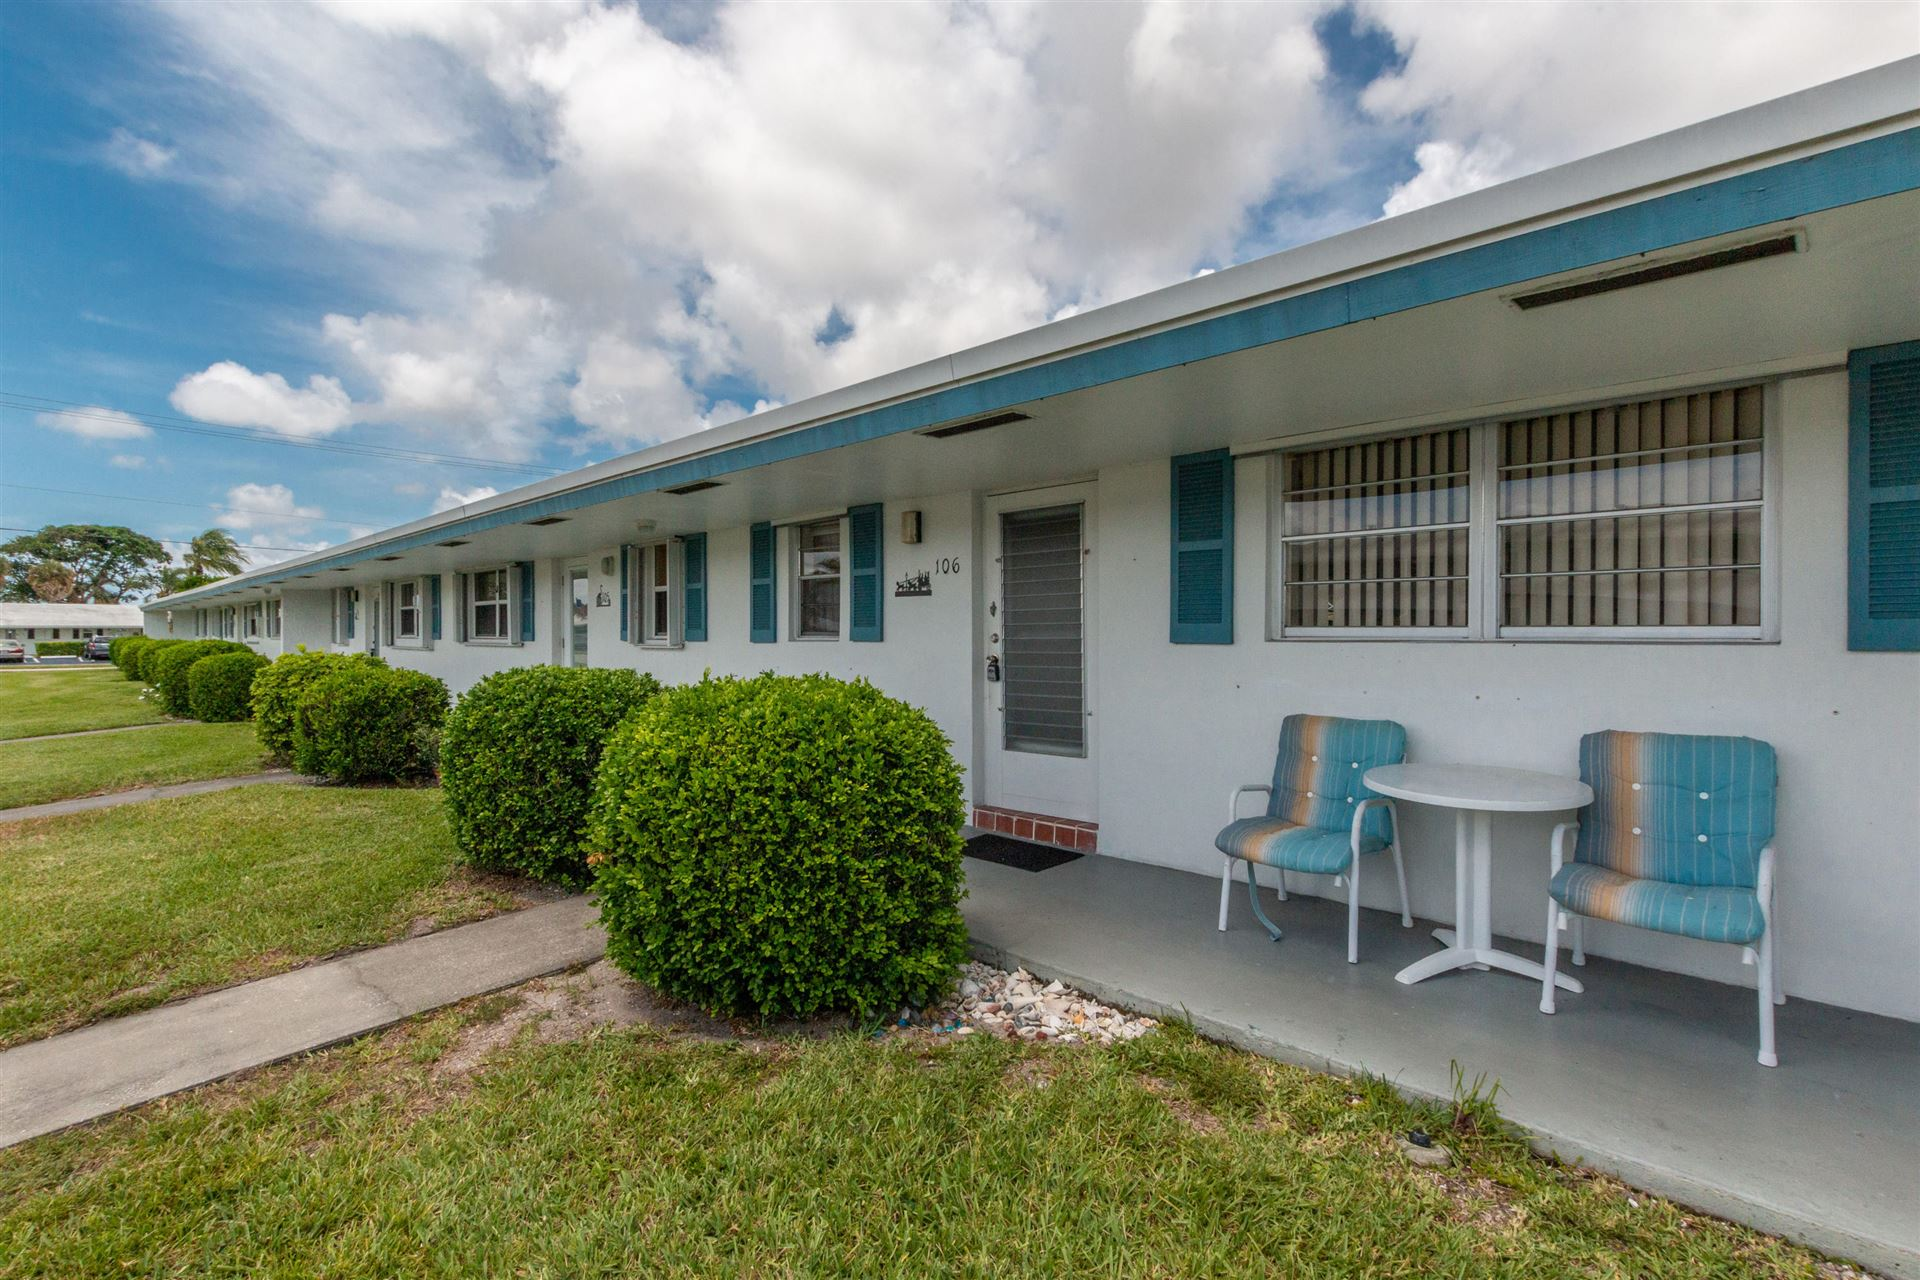 1119 Lake Terrace #106, Boynton Beach, FL 33426 - MLS#: RX-10720940